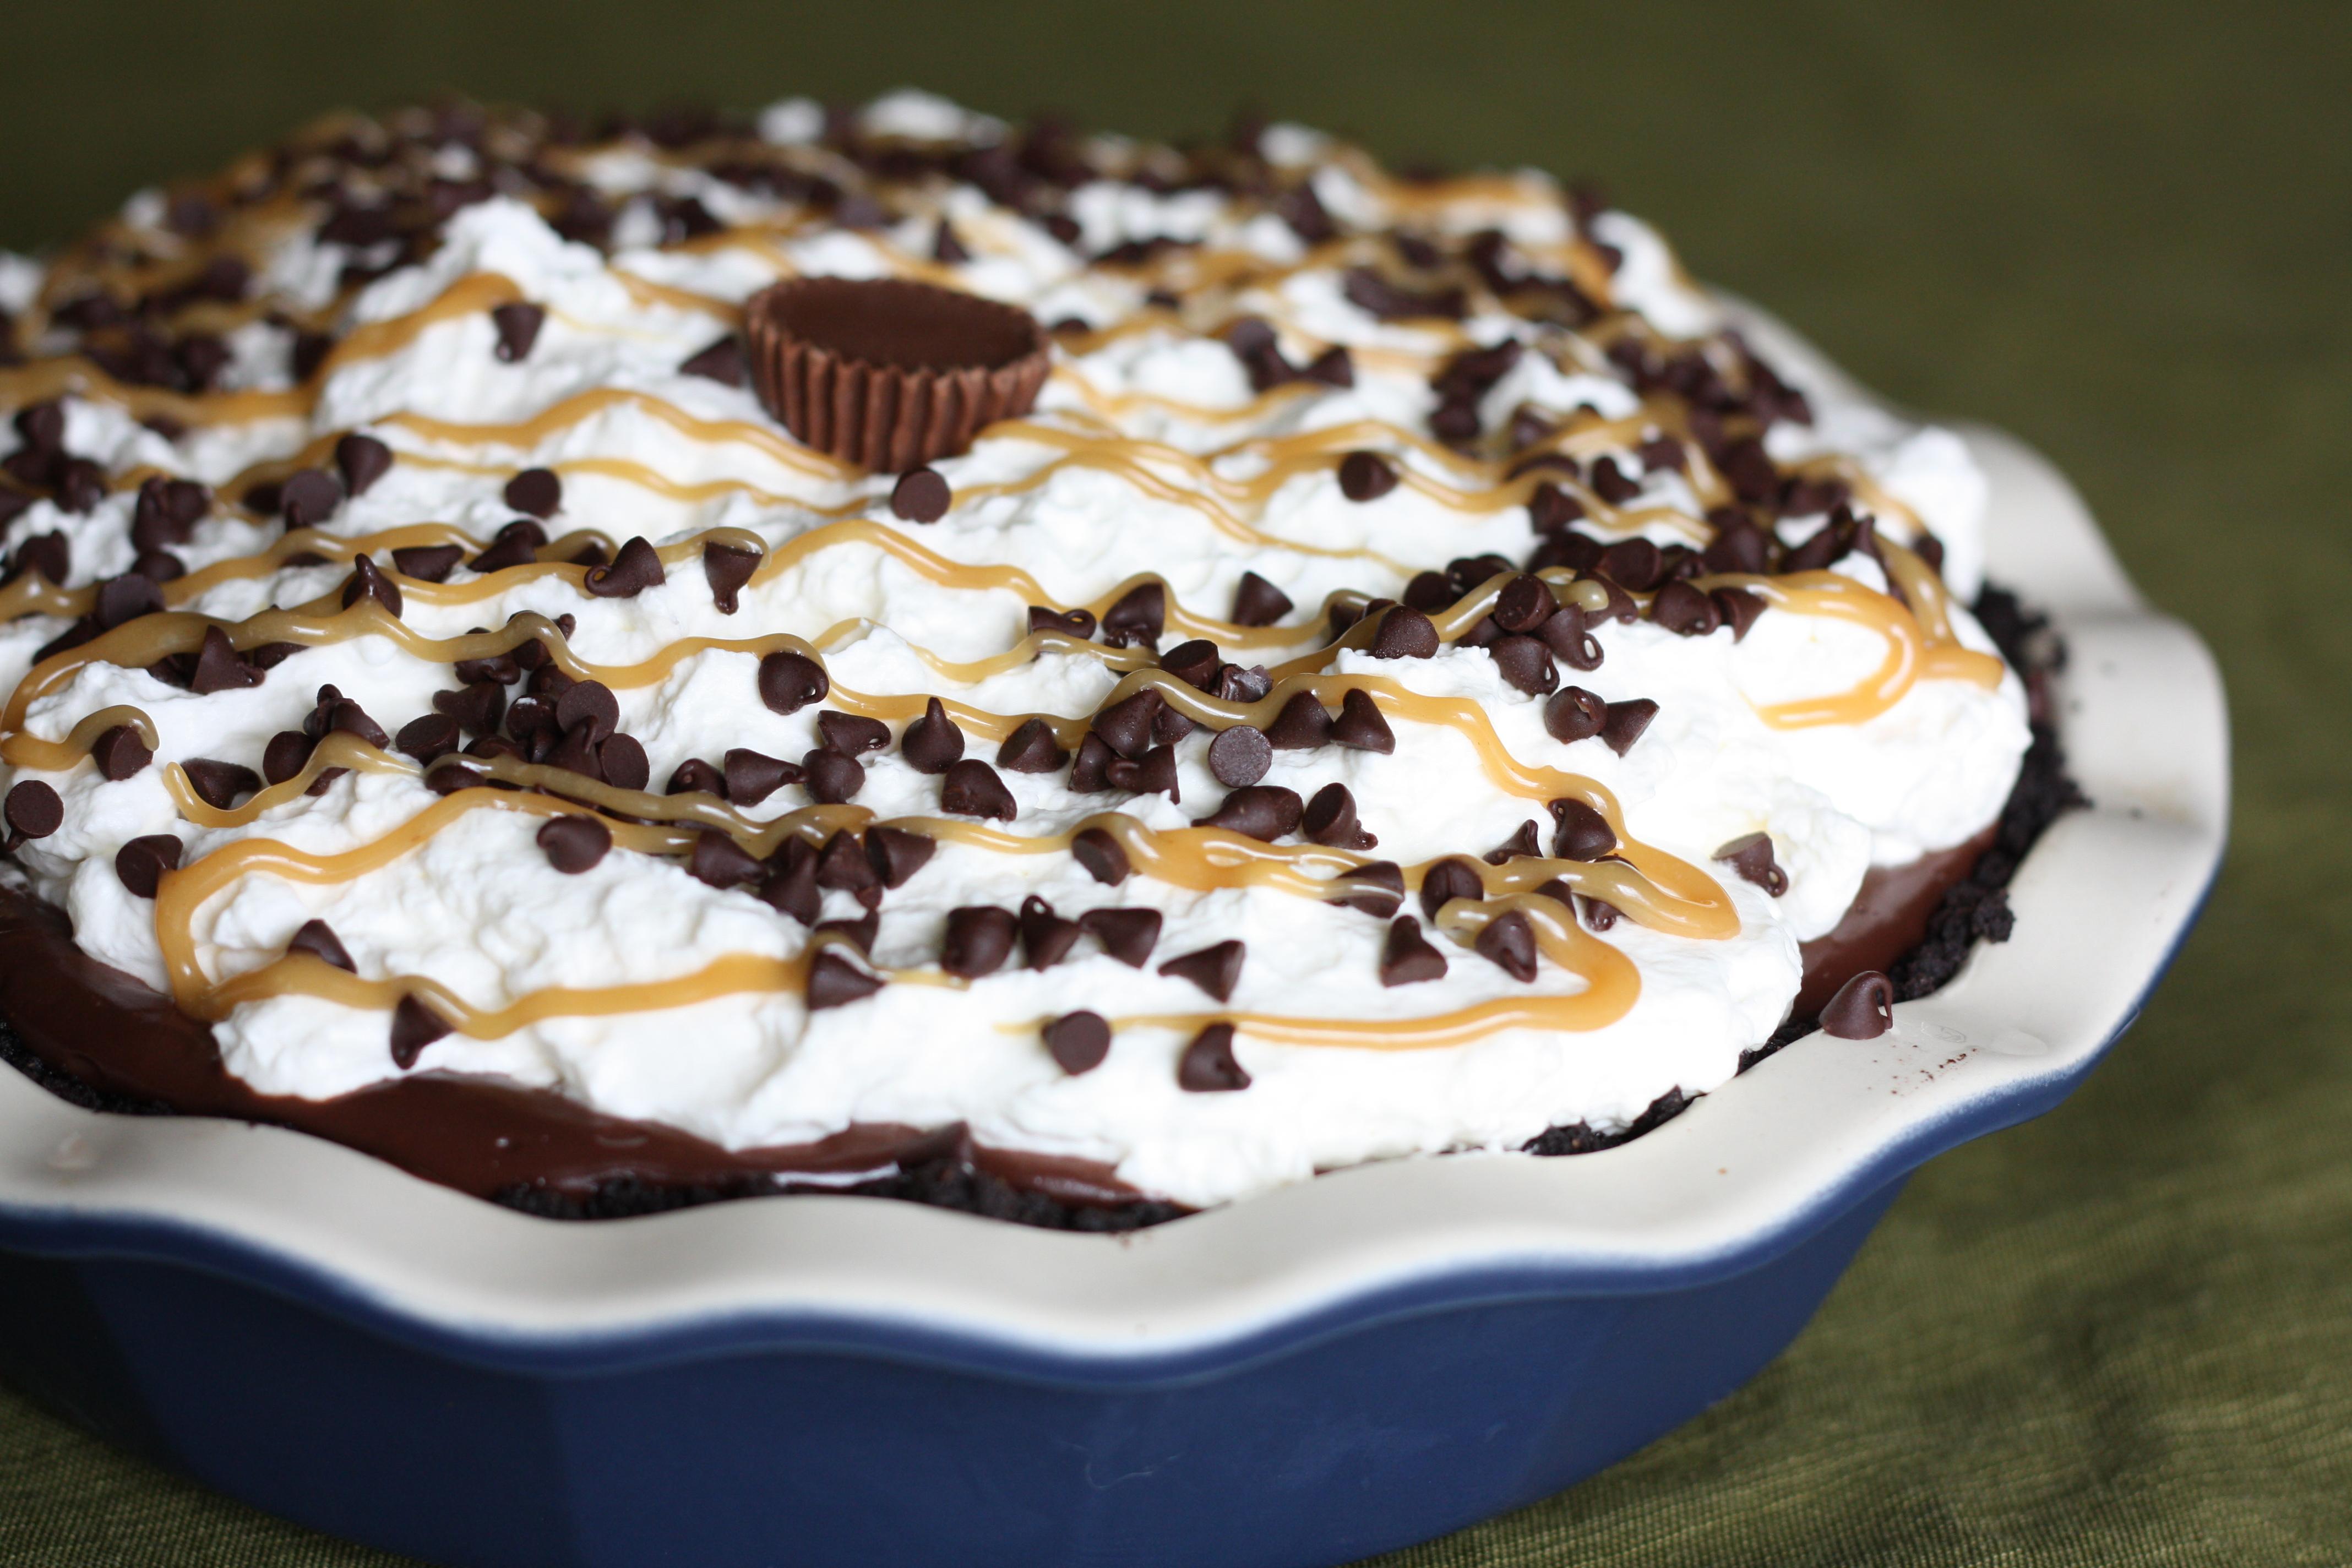 Chocolate Peanut Butter Cream Pie | The Gourmand Mom